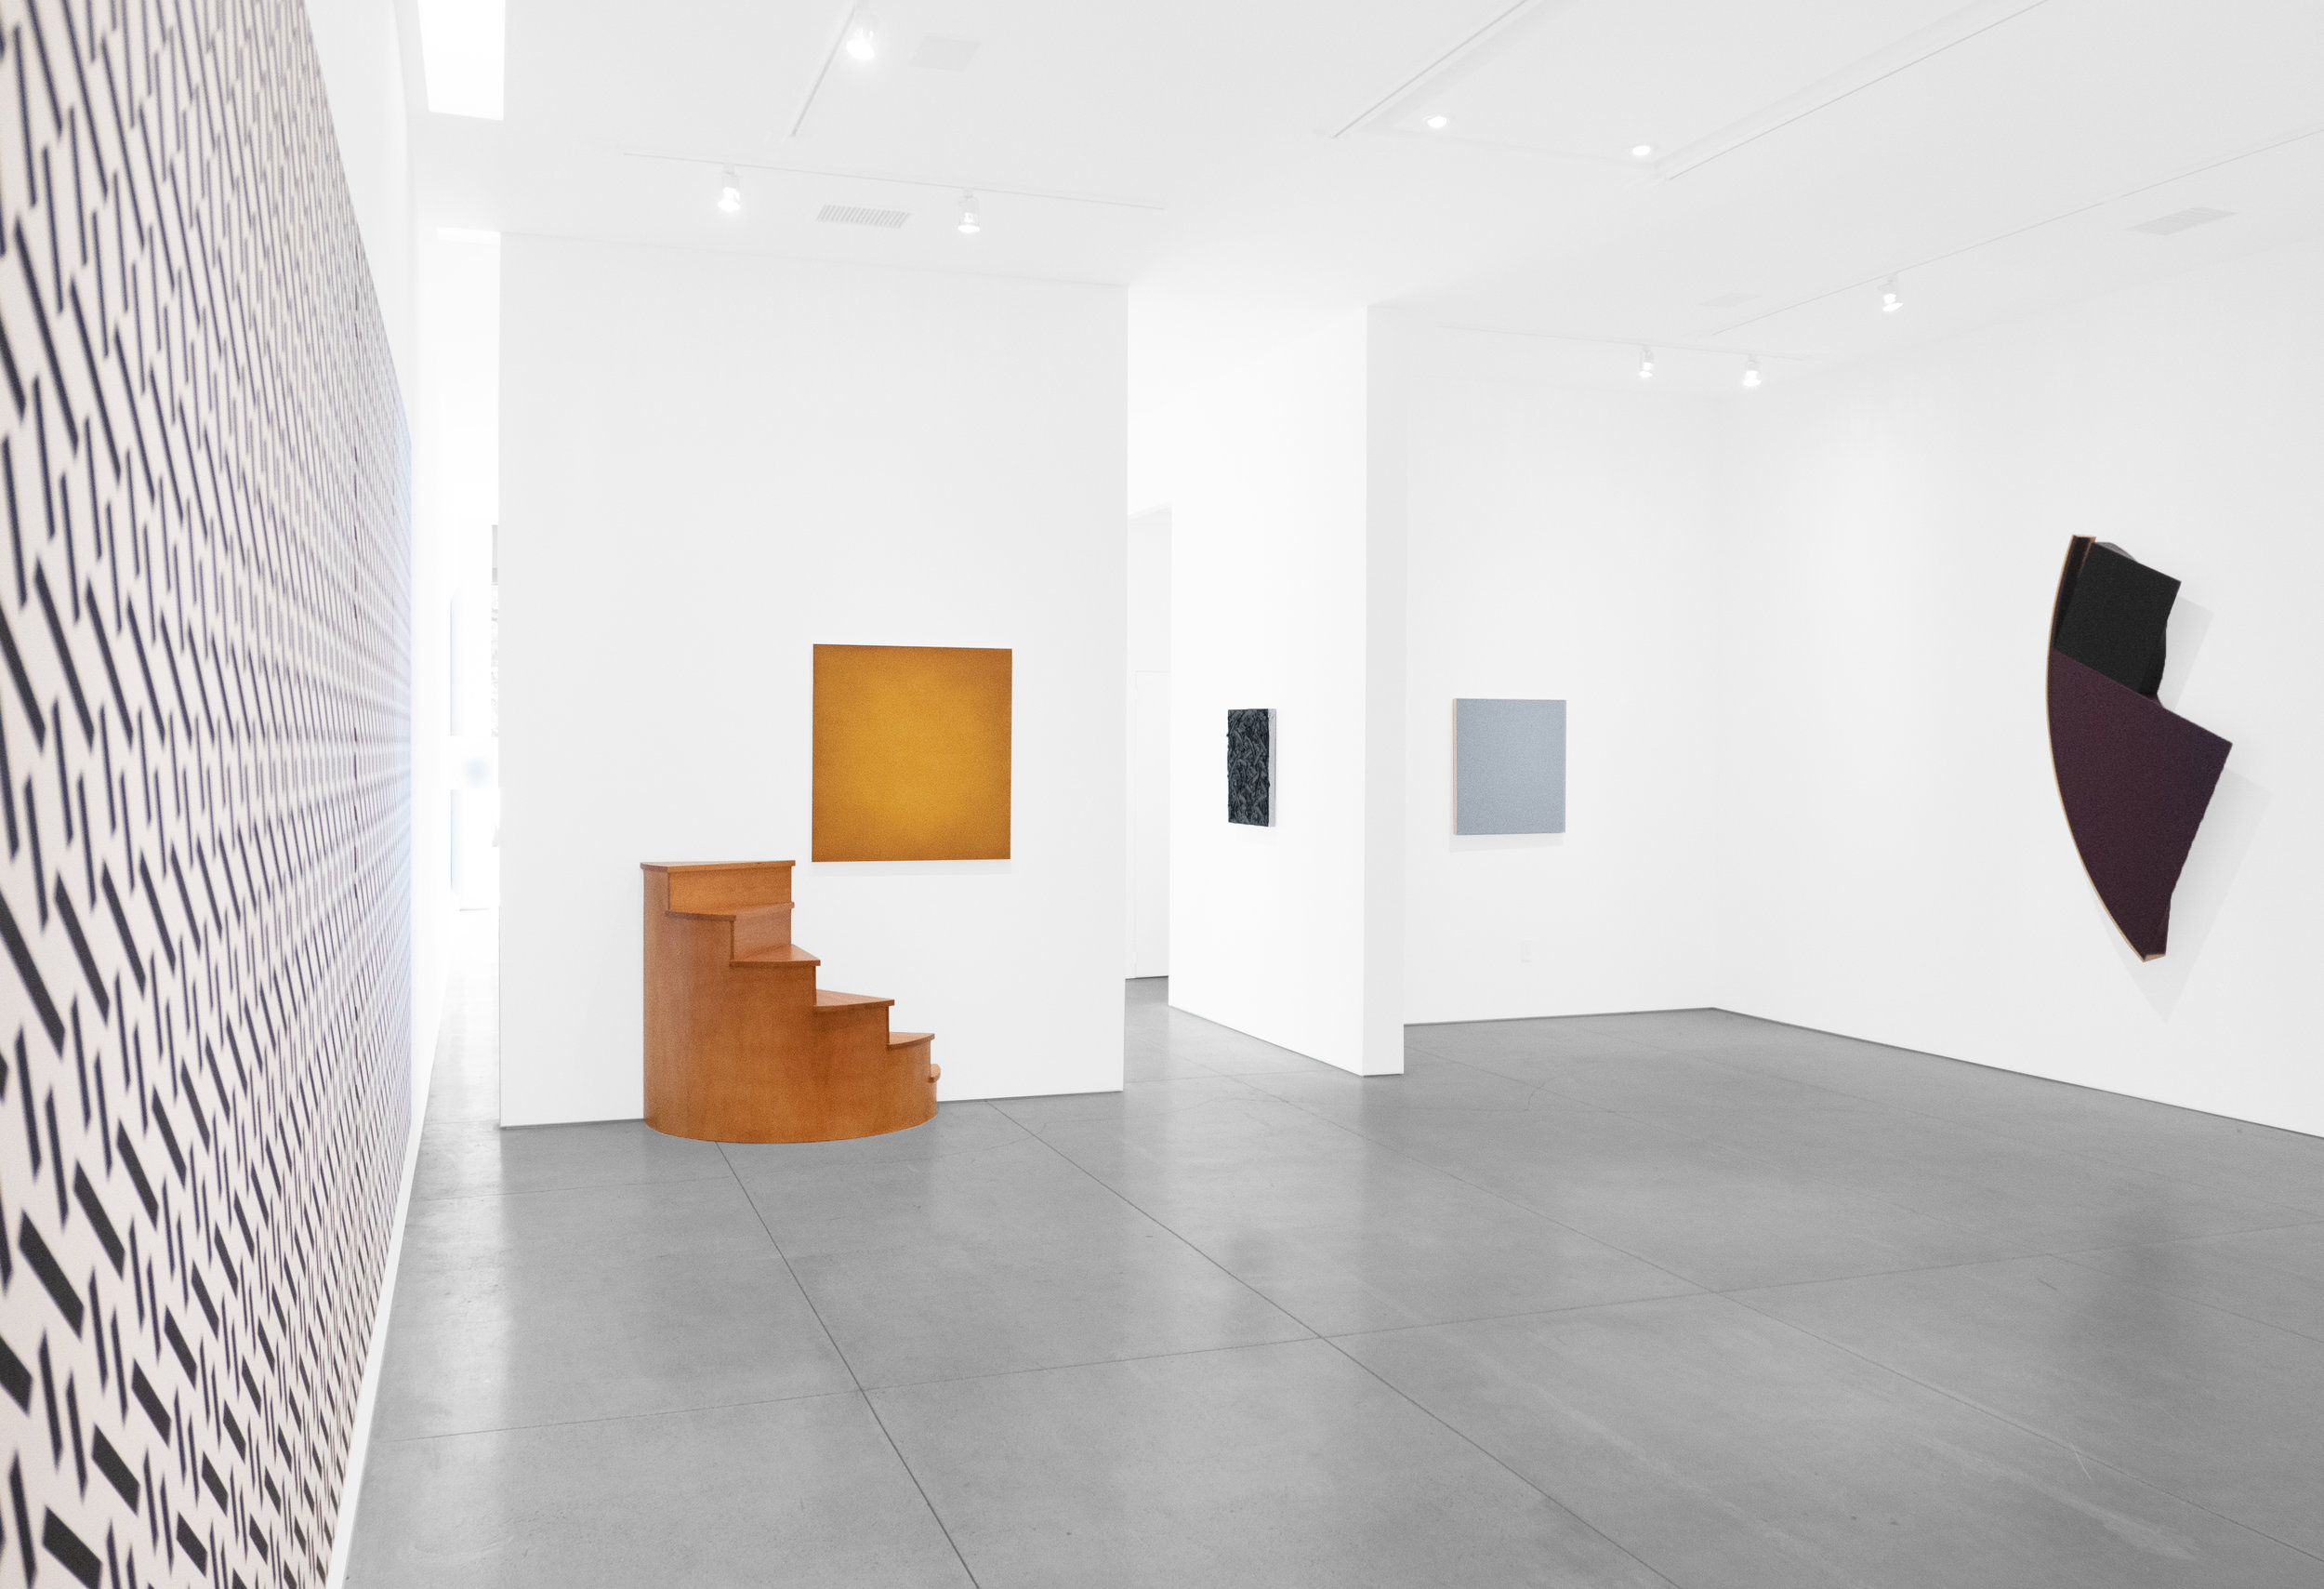 25 Years_Peter Blake Gallery_2019_Installation View_19.jpg